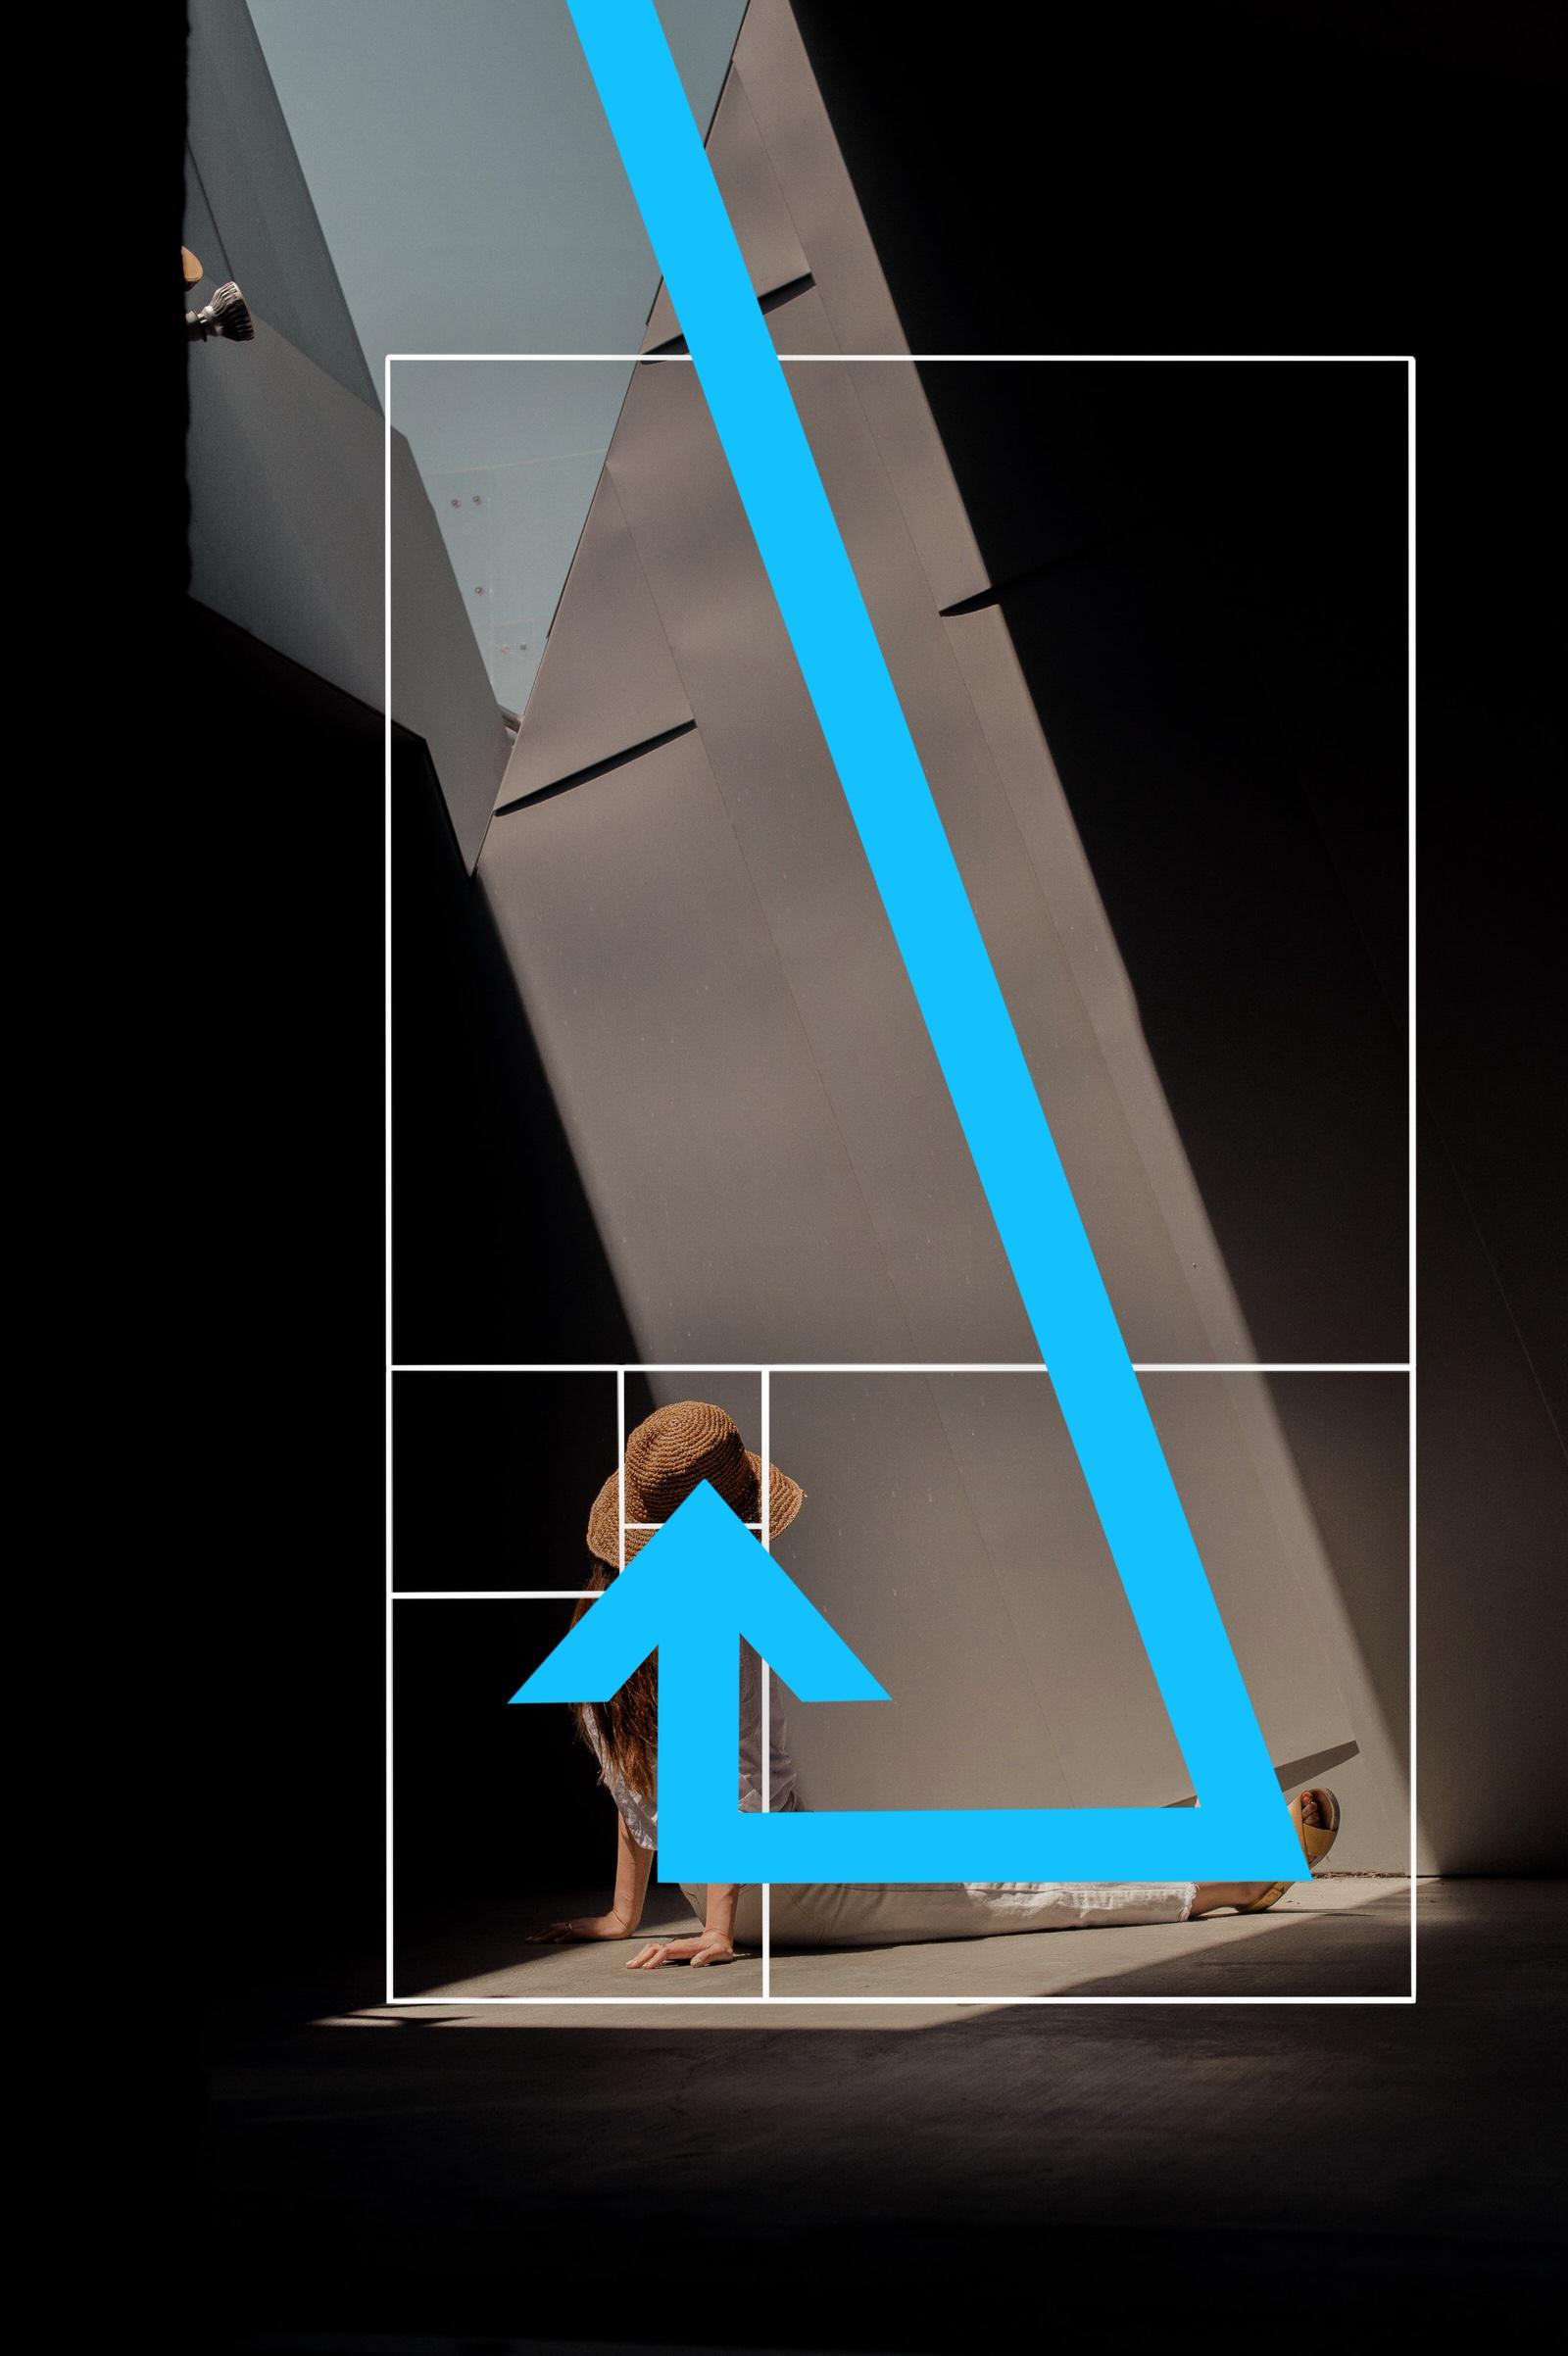 Diagonal Lines Golden Ratio Example